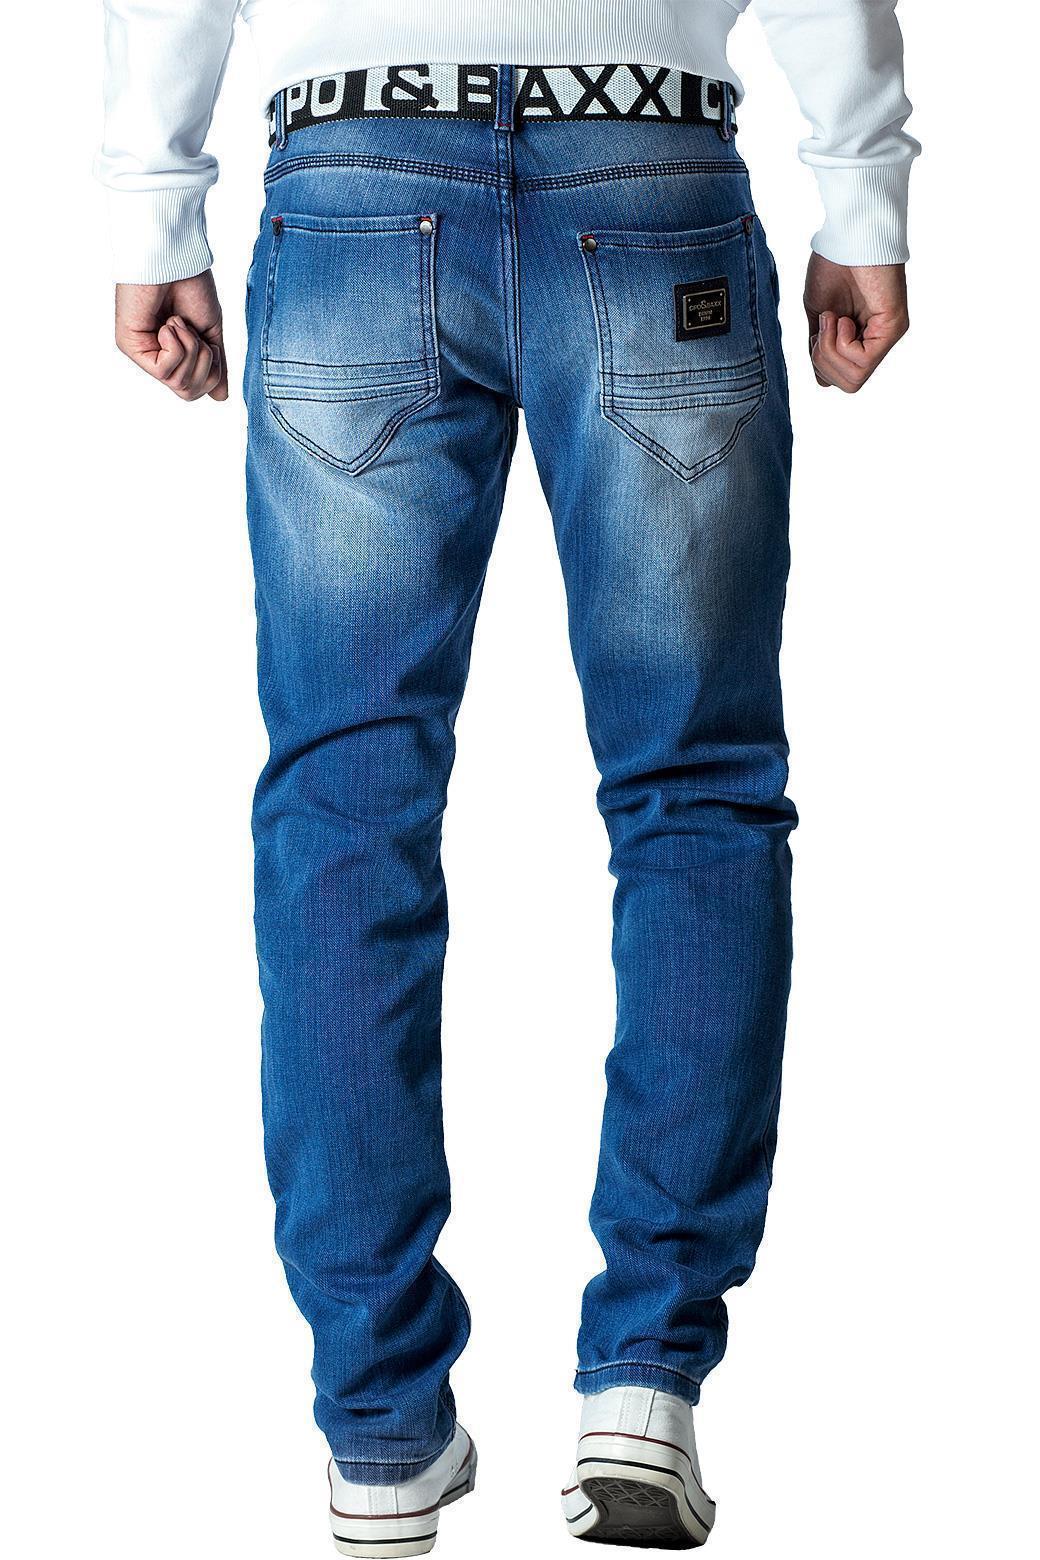 Cipo-amp-Baxx-Uomo-Jeans-Pantaloni-ricamate-Biker-Style-streetwear-nervature-pattern-Dope miniatura 20